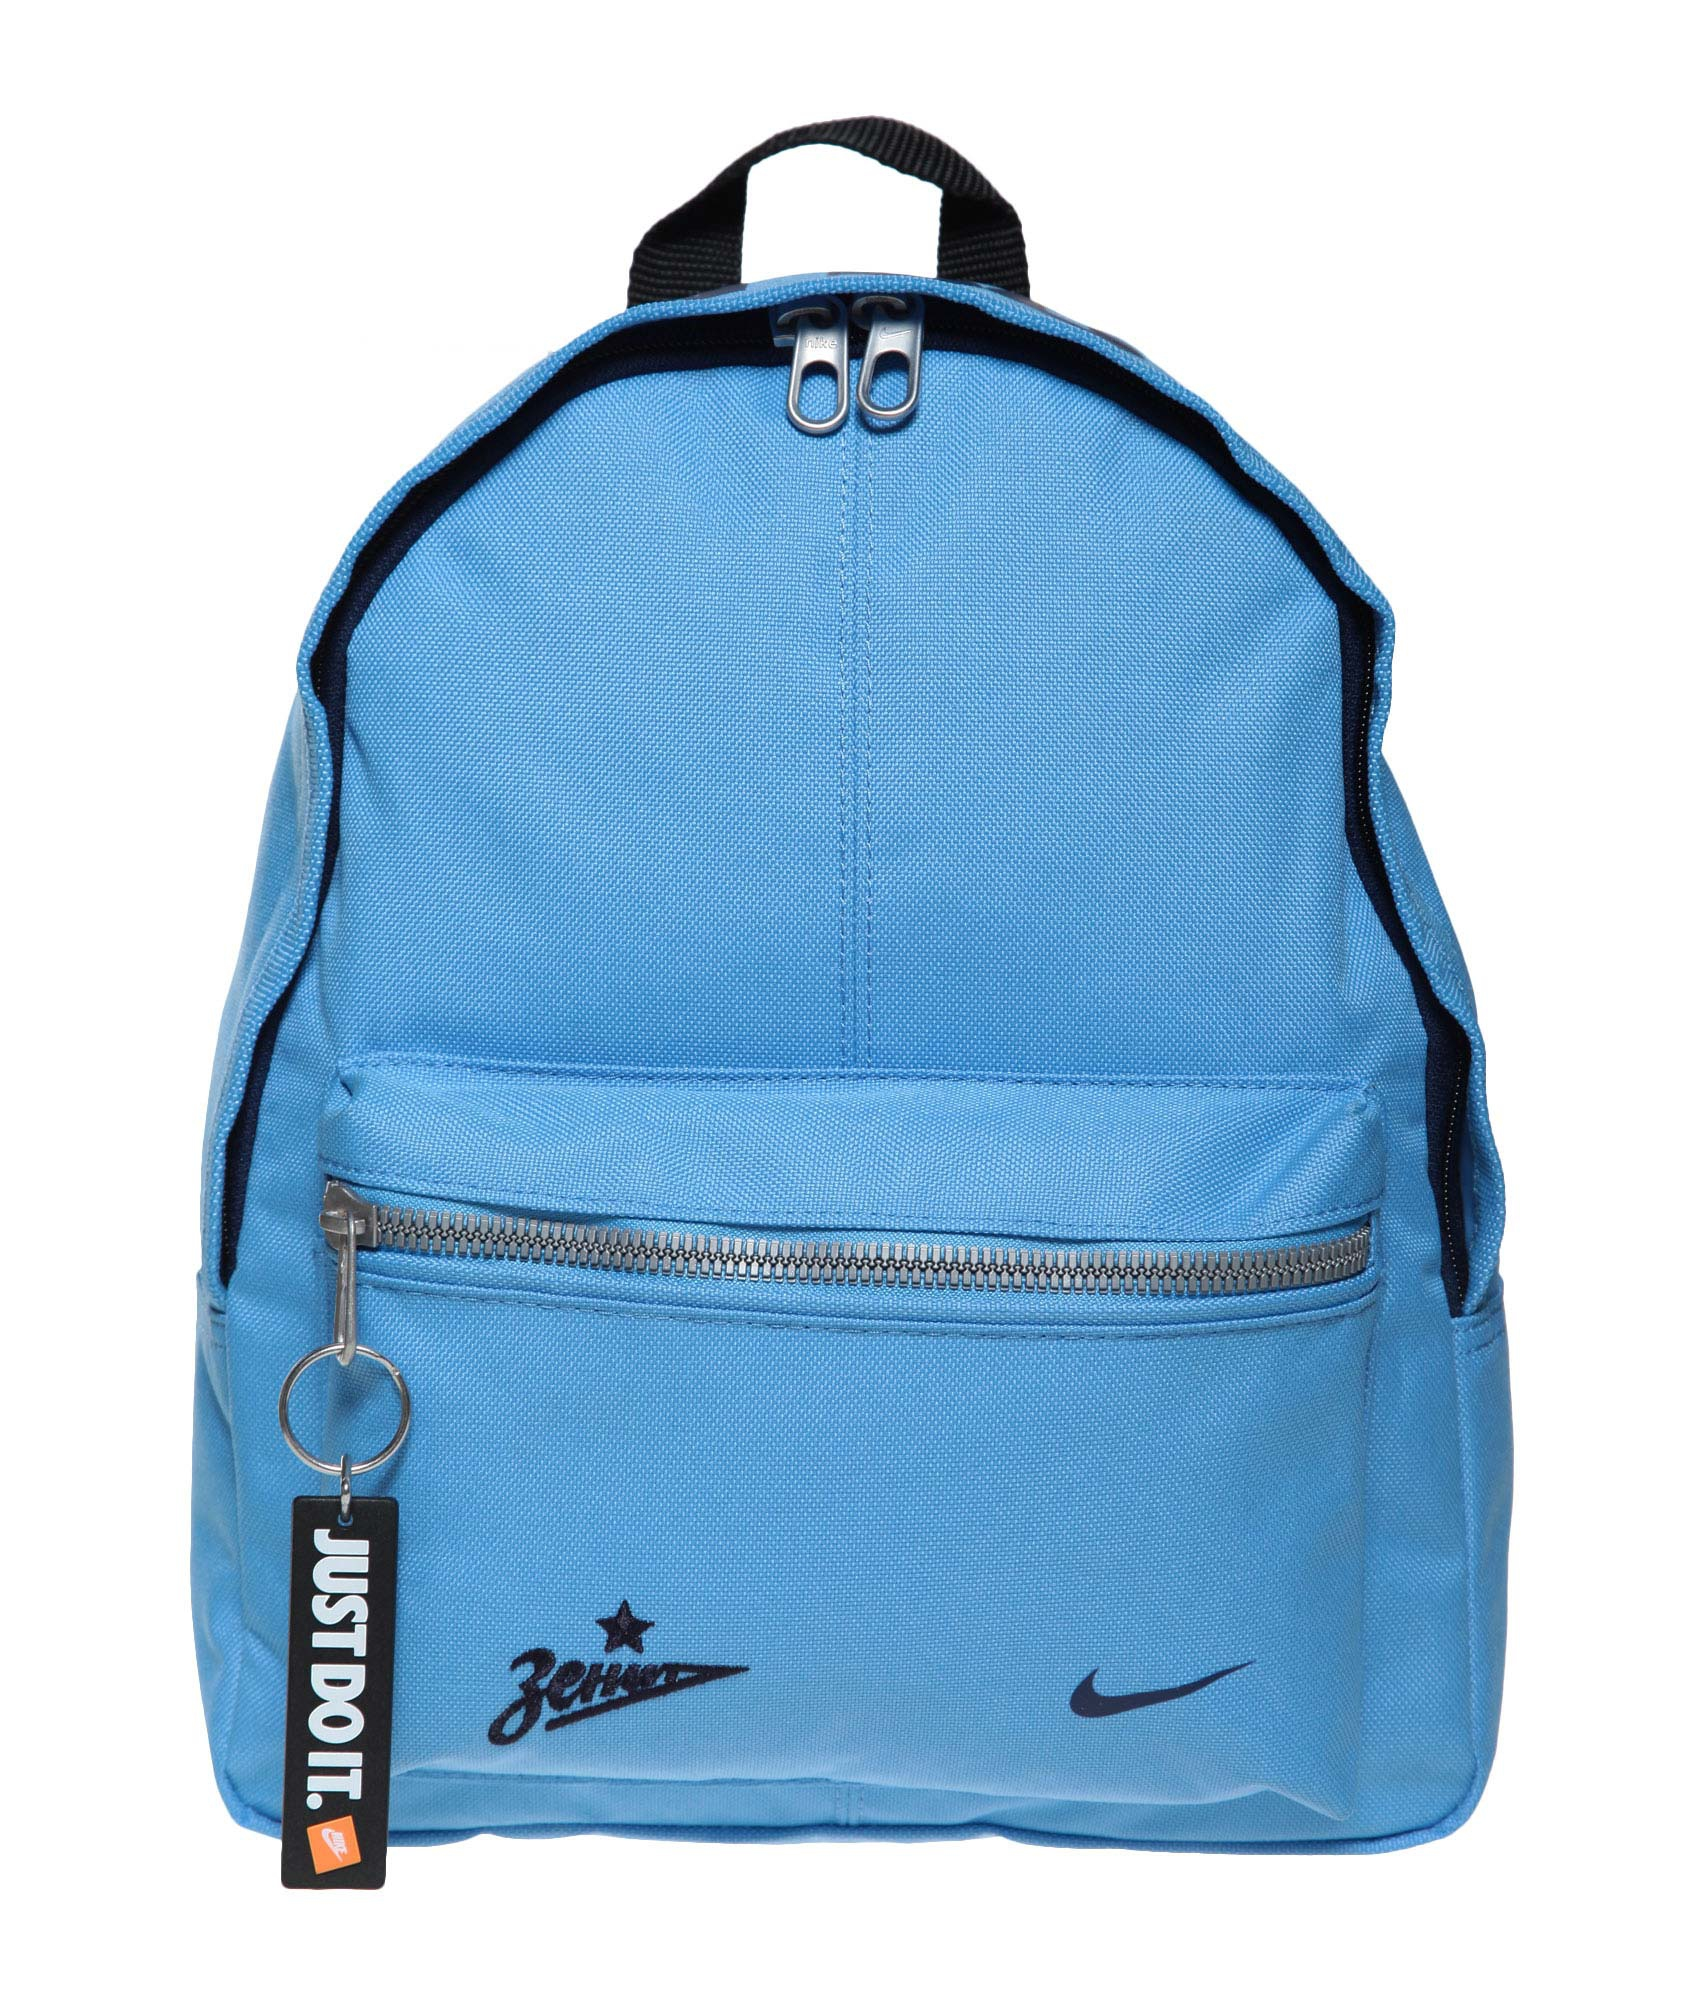 Рюкзак детский Nike, Цвет-Голубой, Размер-MISC поло nike цвет голубой размер m